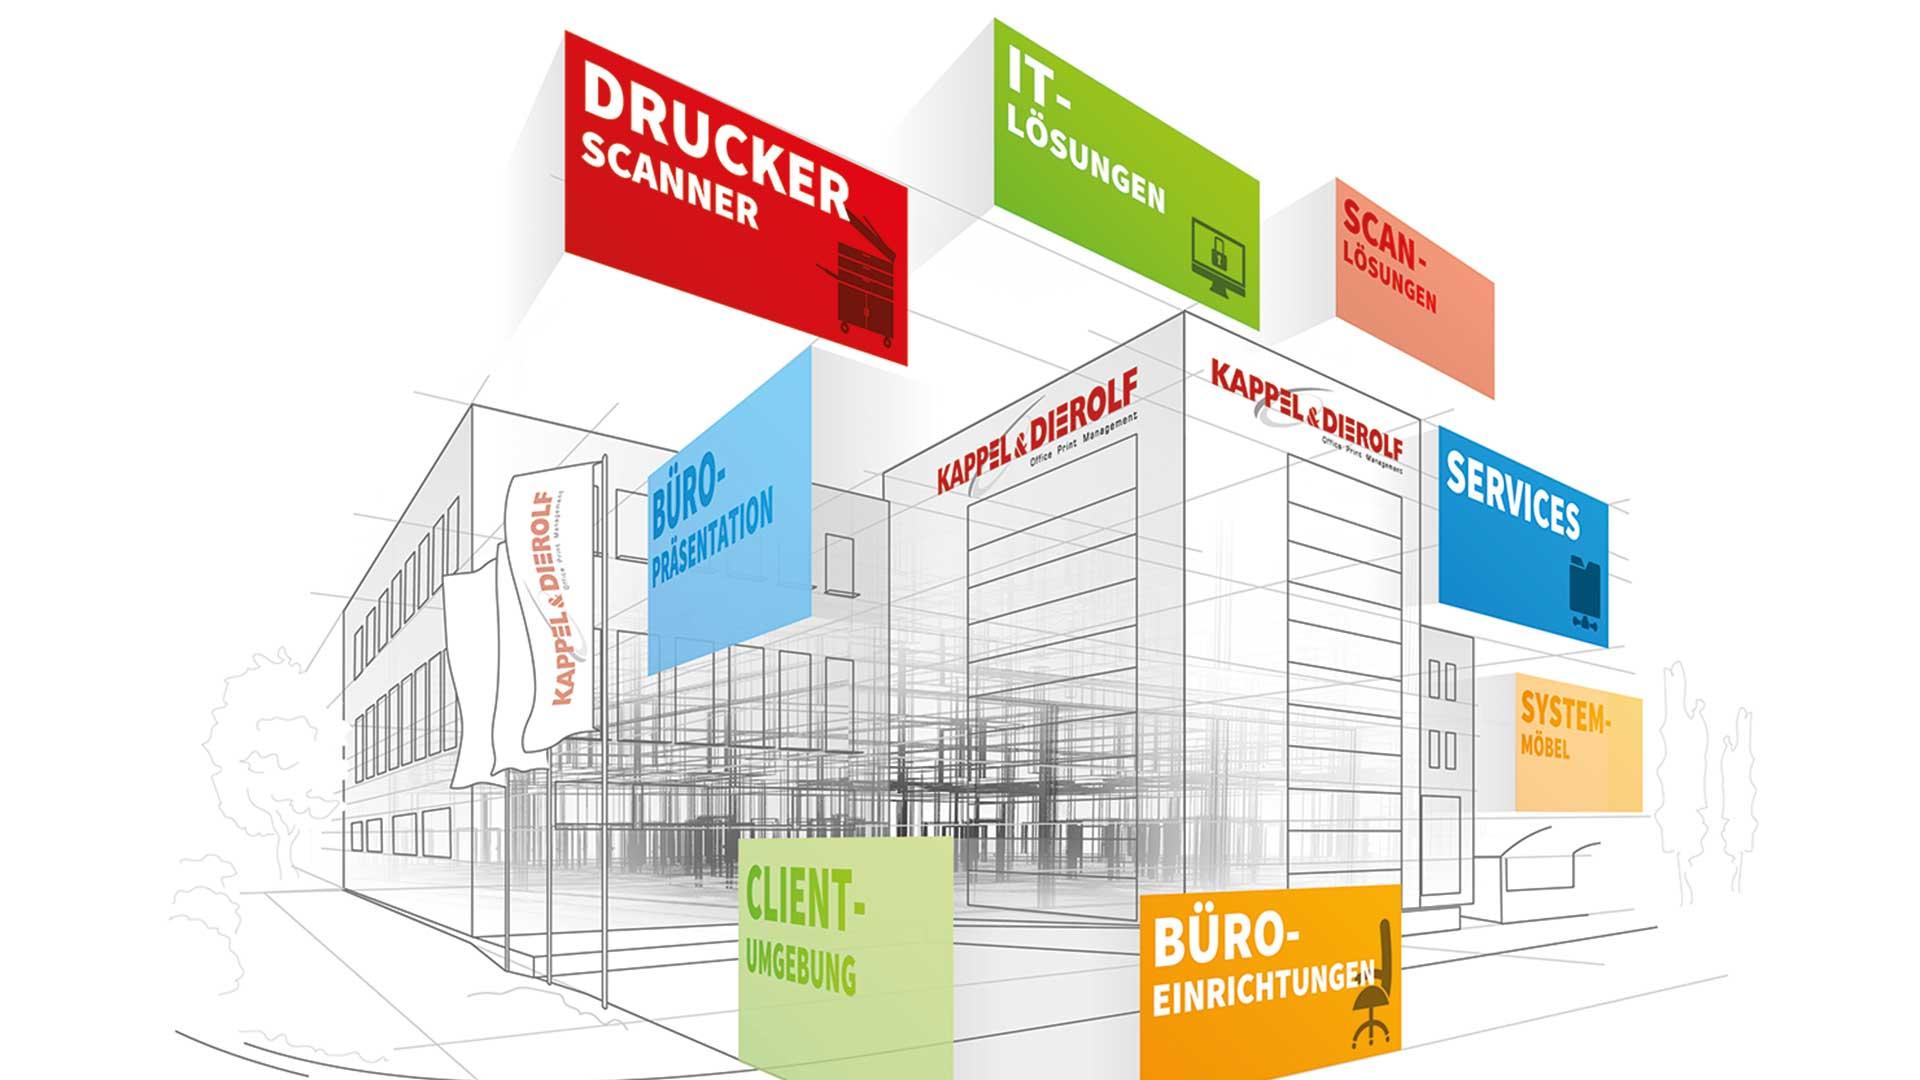 Kappel & Dierolf GmbH & Co. KG